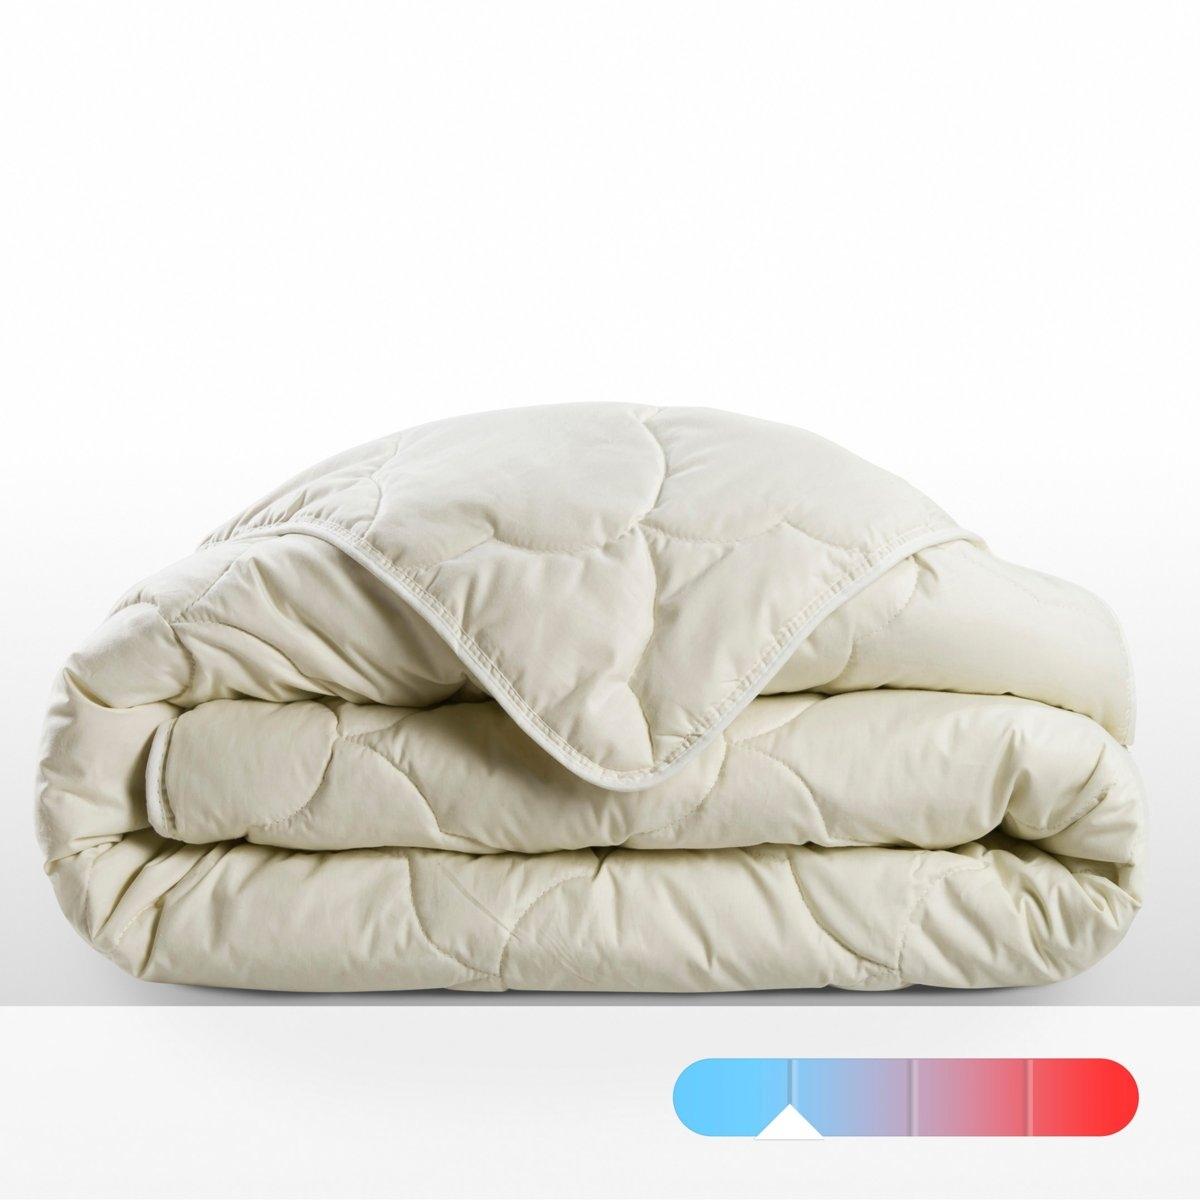 купить Одеяло La Redoute Летнее 140 x 200 см белый по цене 9249 рублей